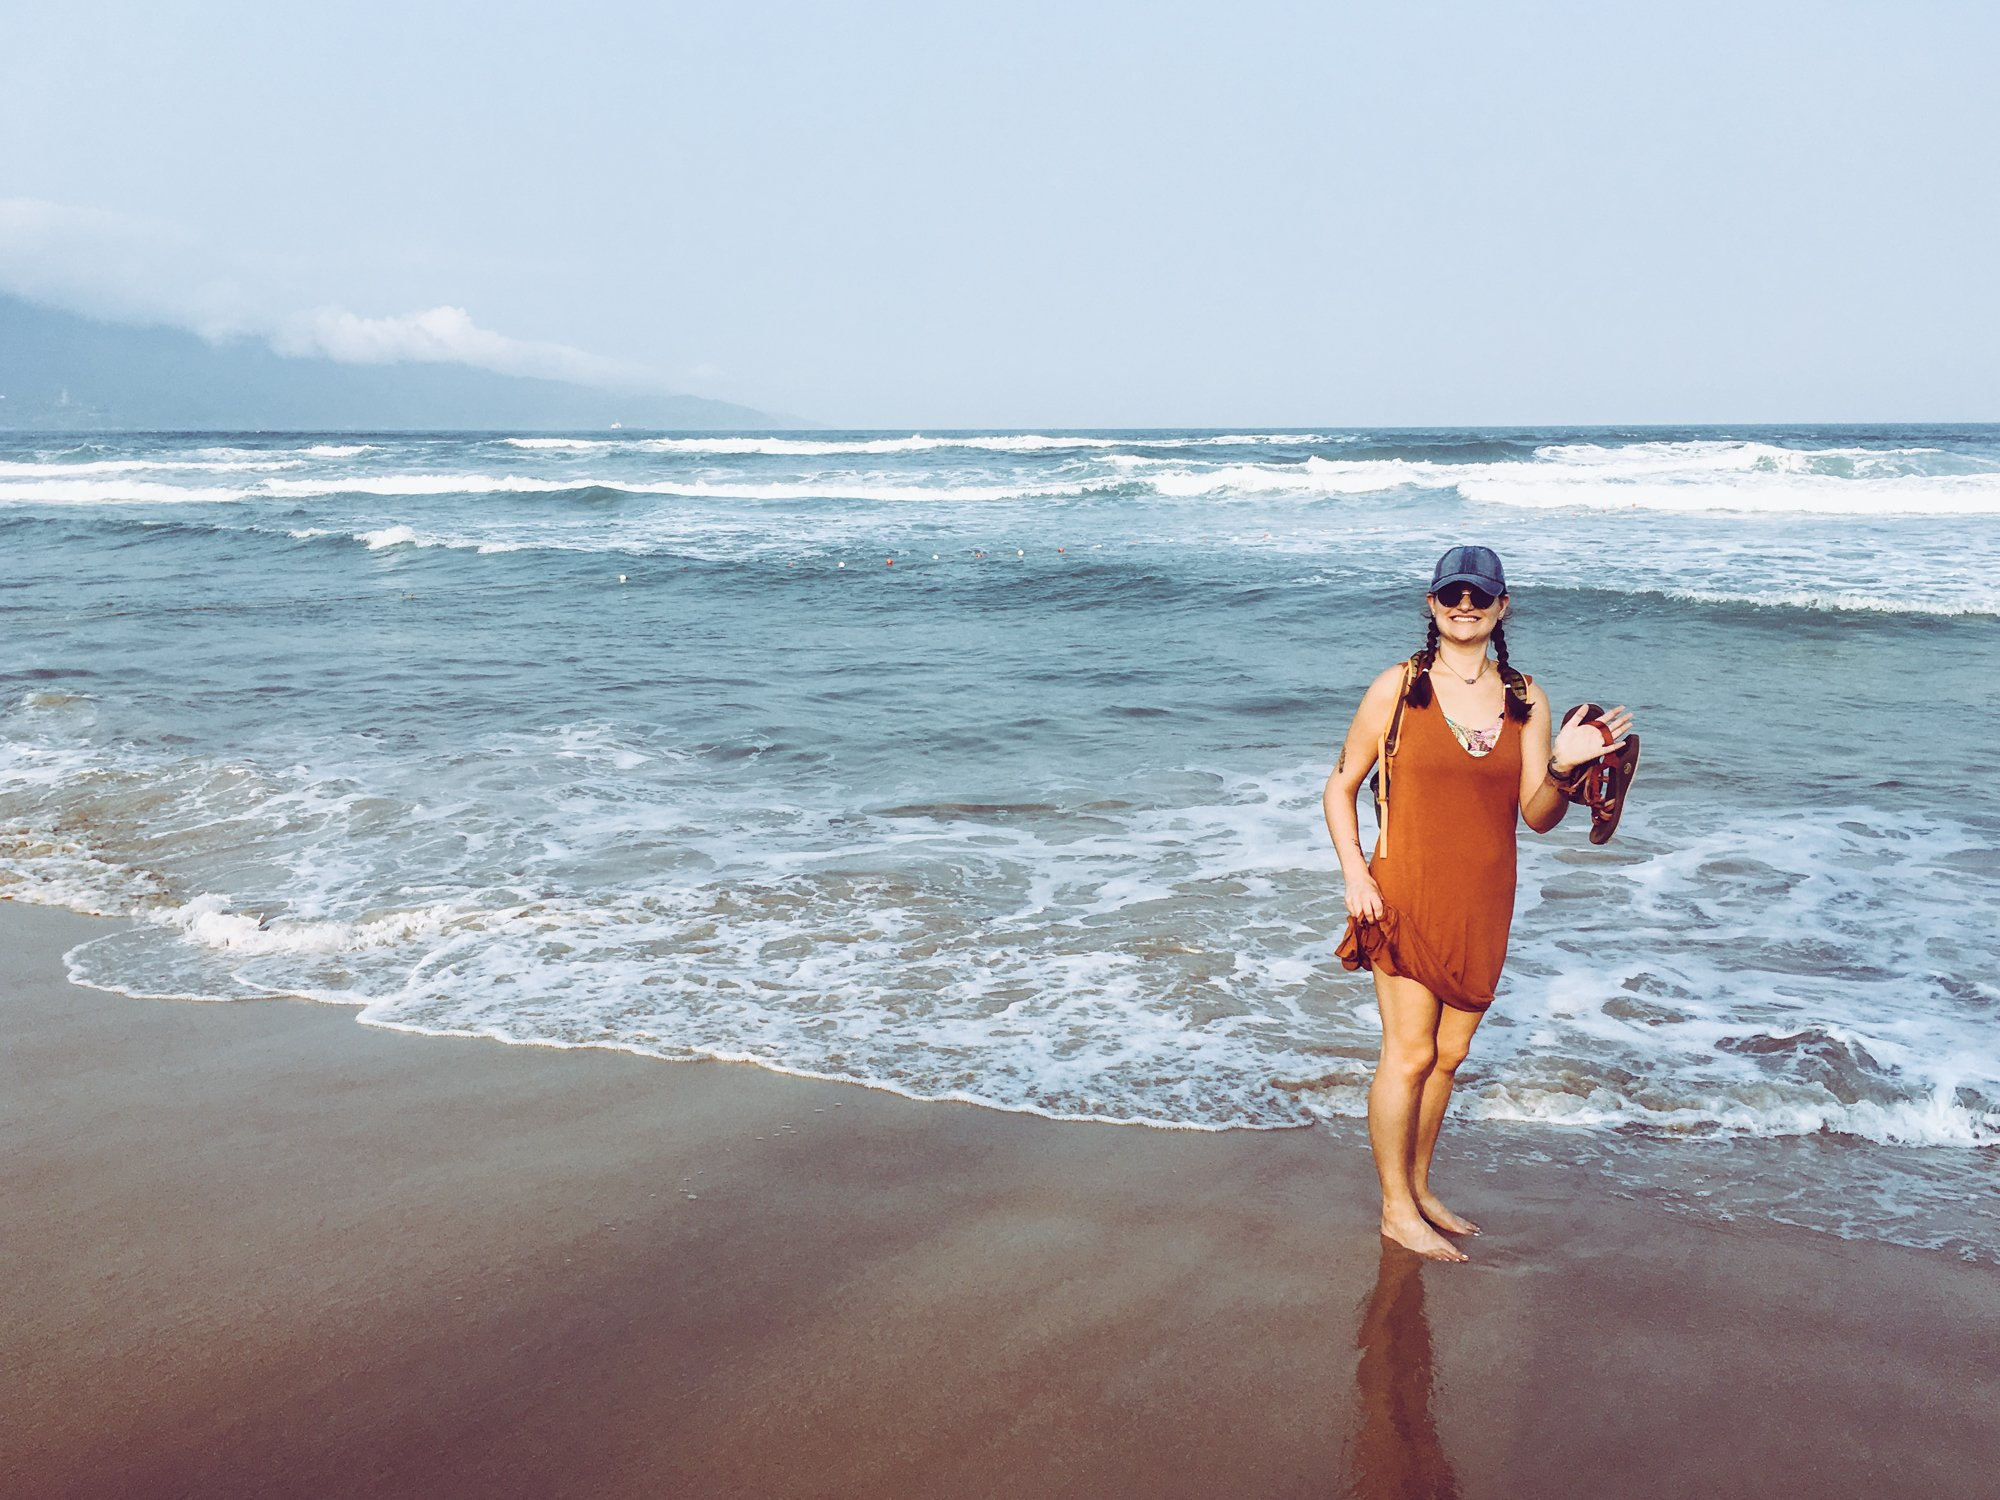 Hanging out on My Khe Beach in Da Nang Vietnam